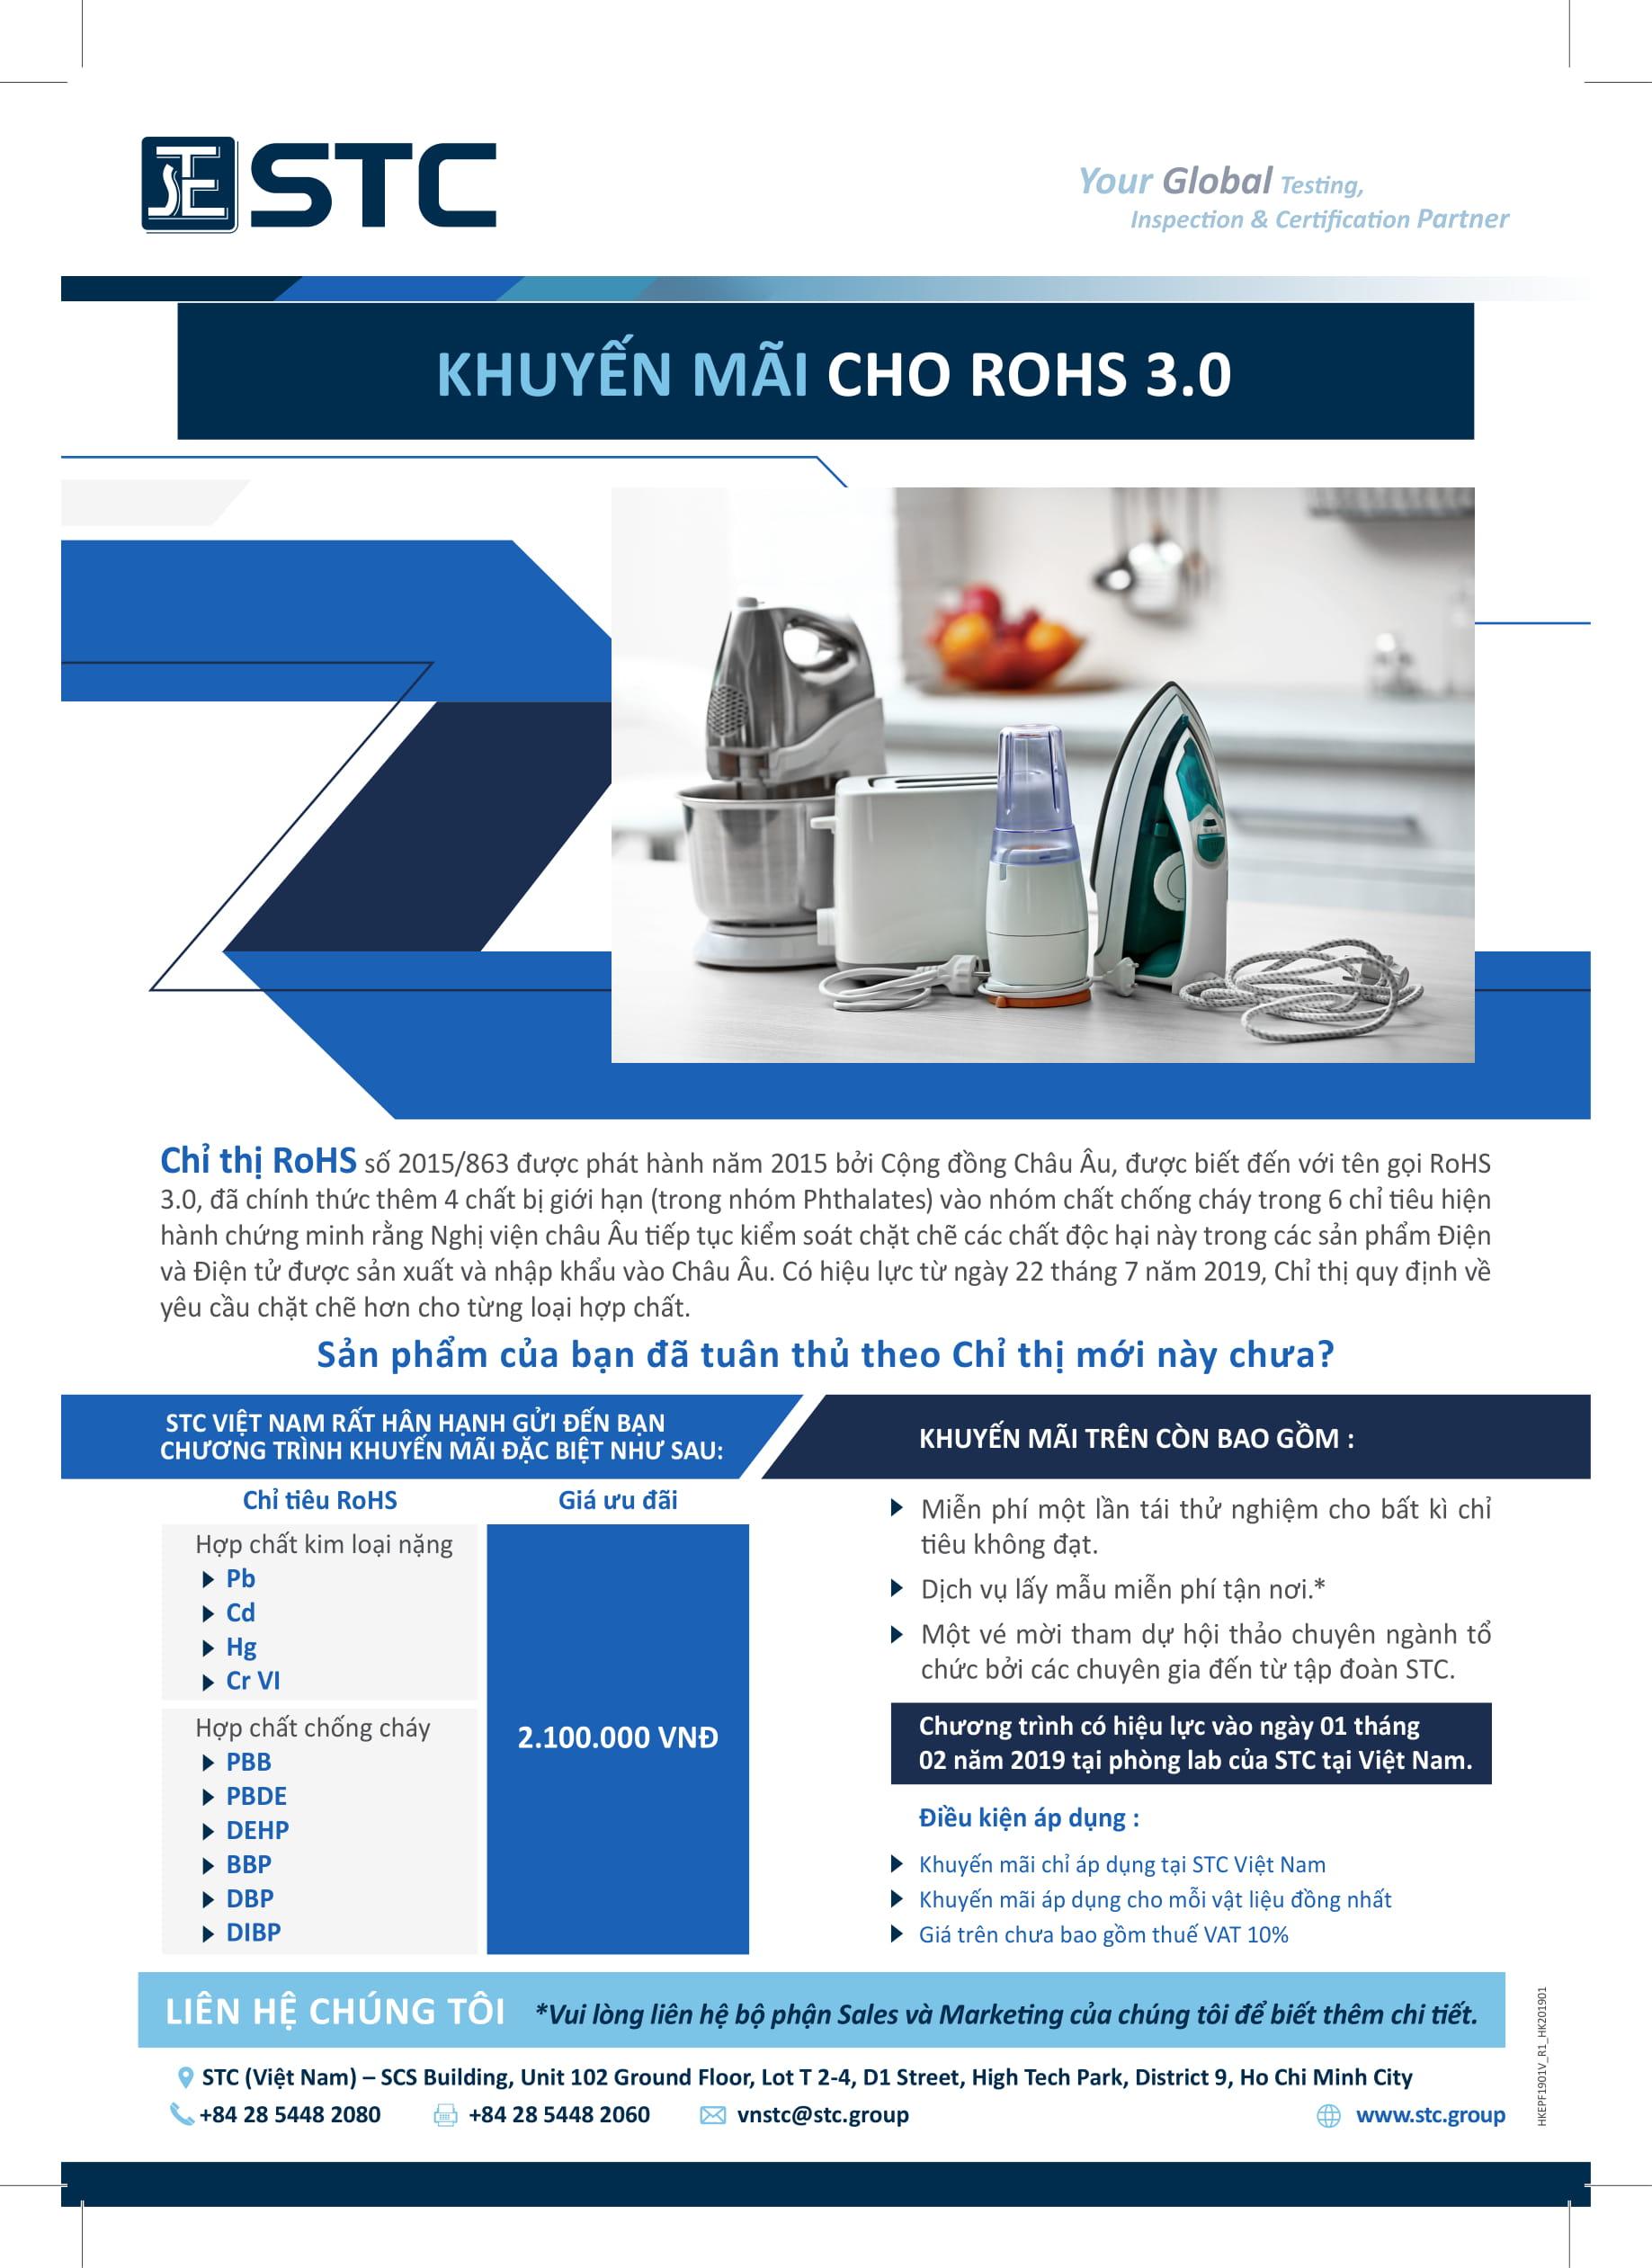 Promotion RoHS 3.0-2.jpg